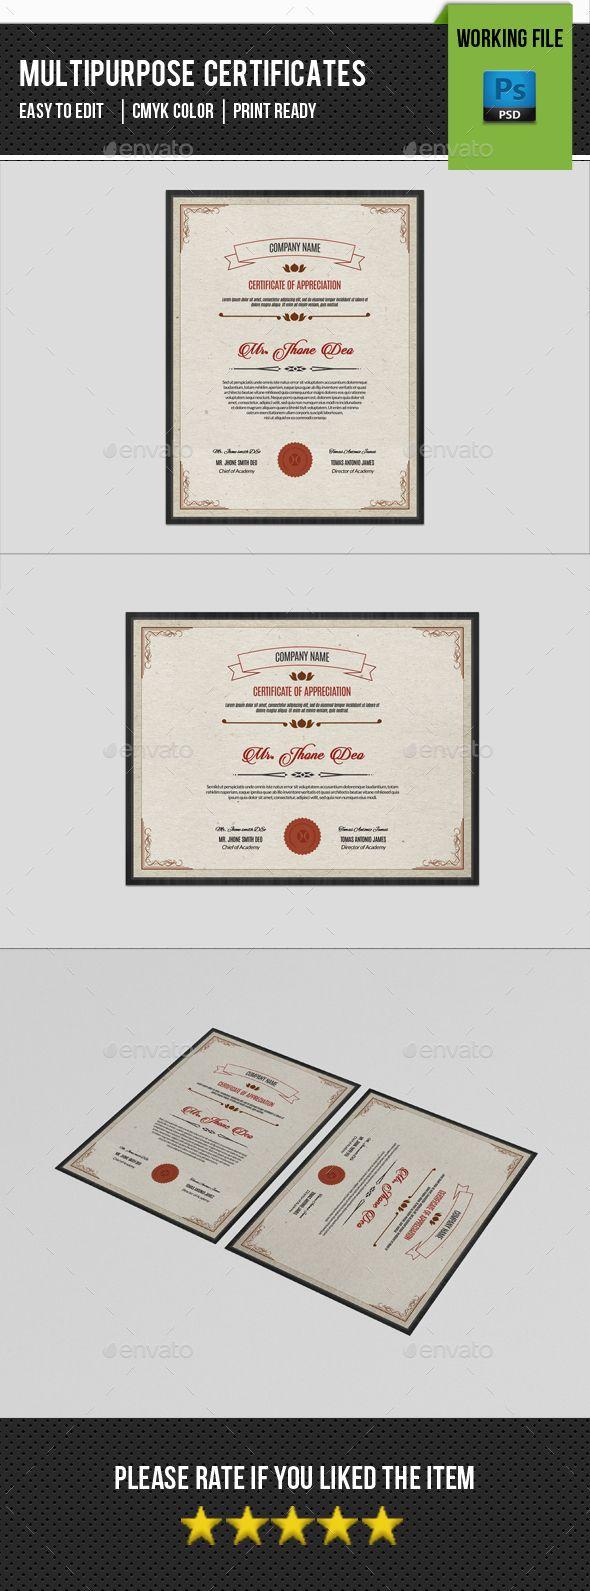 90 best certificate images on Pinterest | Preschool, Award ...